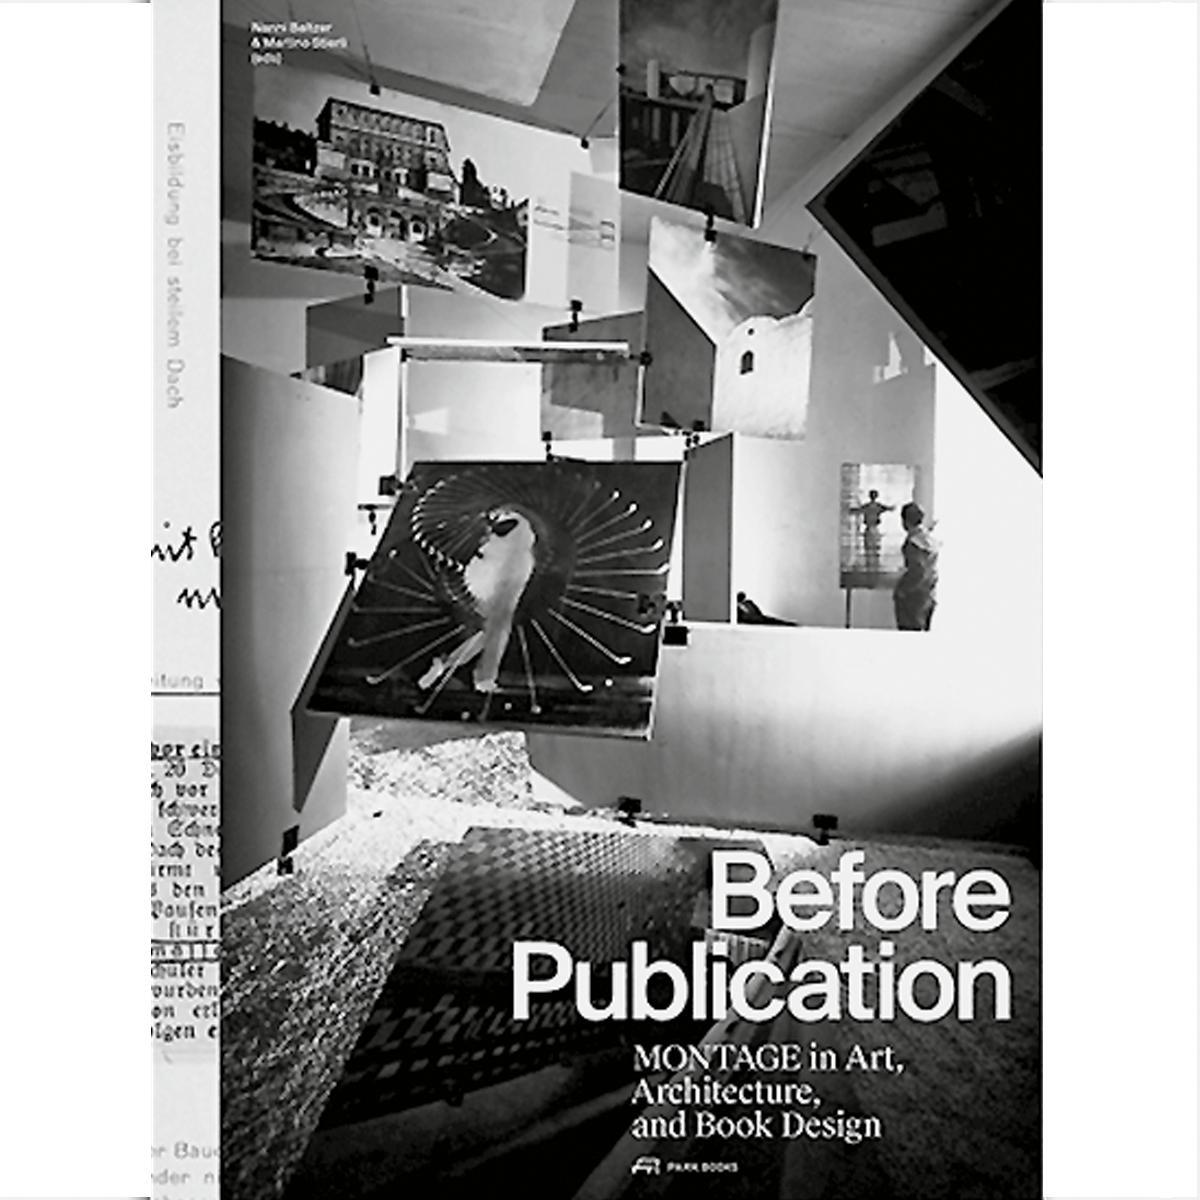 Before Publication